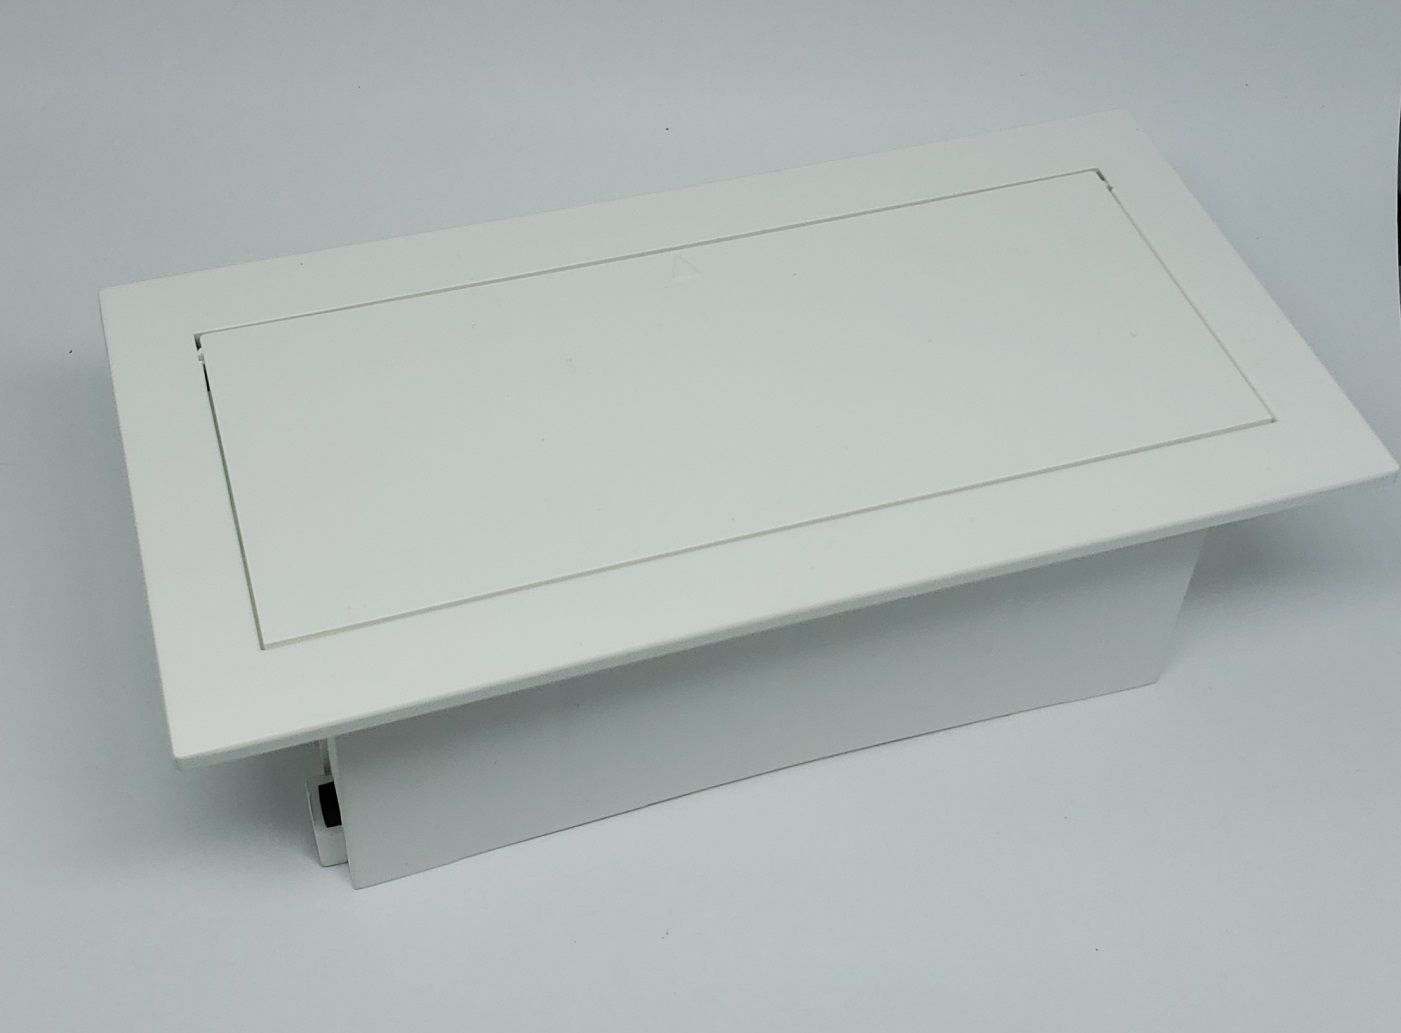 Caixa de Embutir Facility P/ 6 Blocos (vazia)